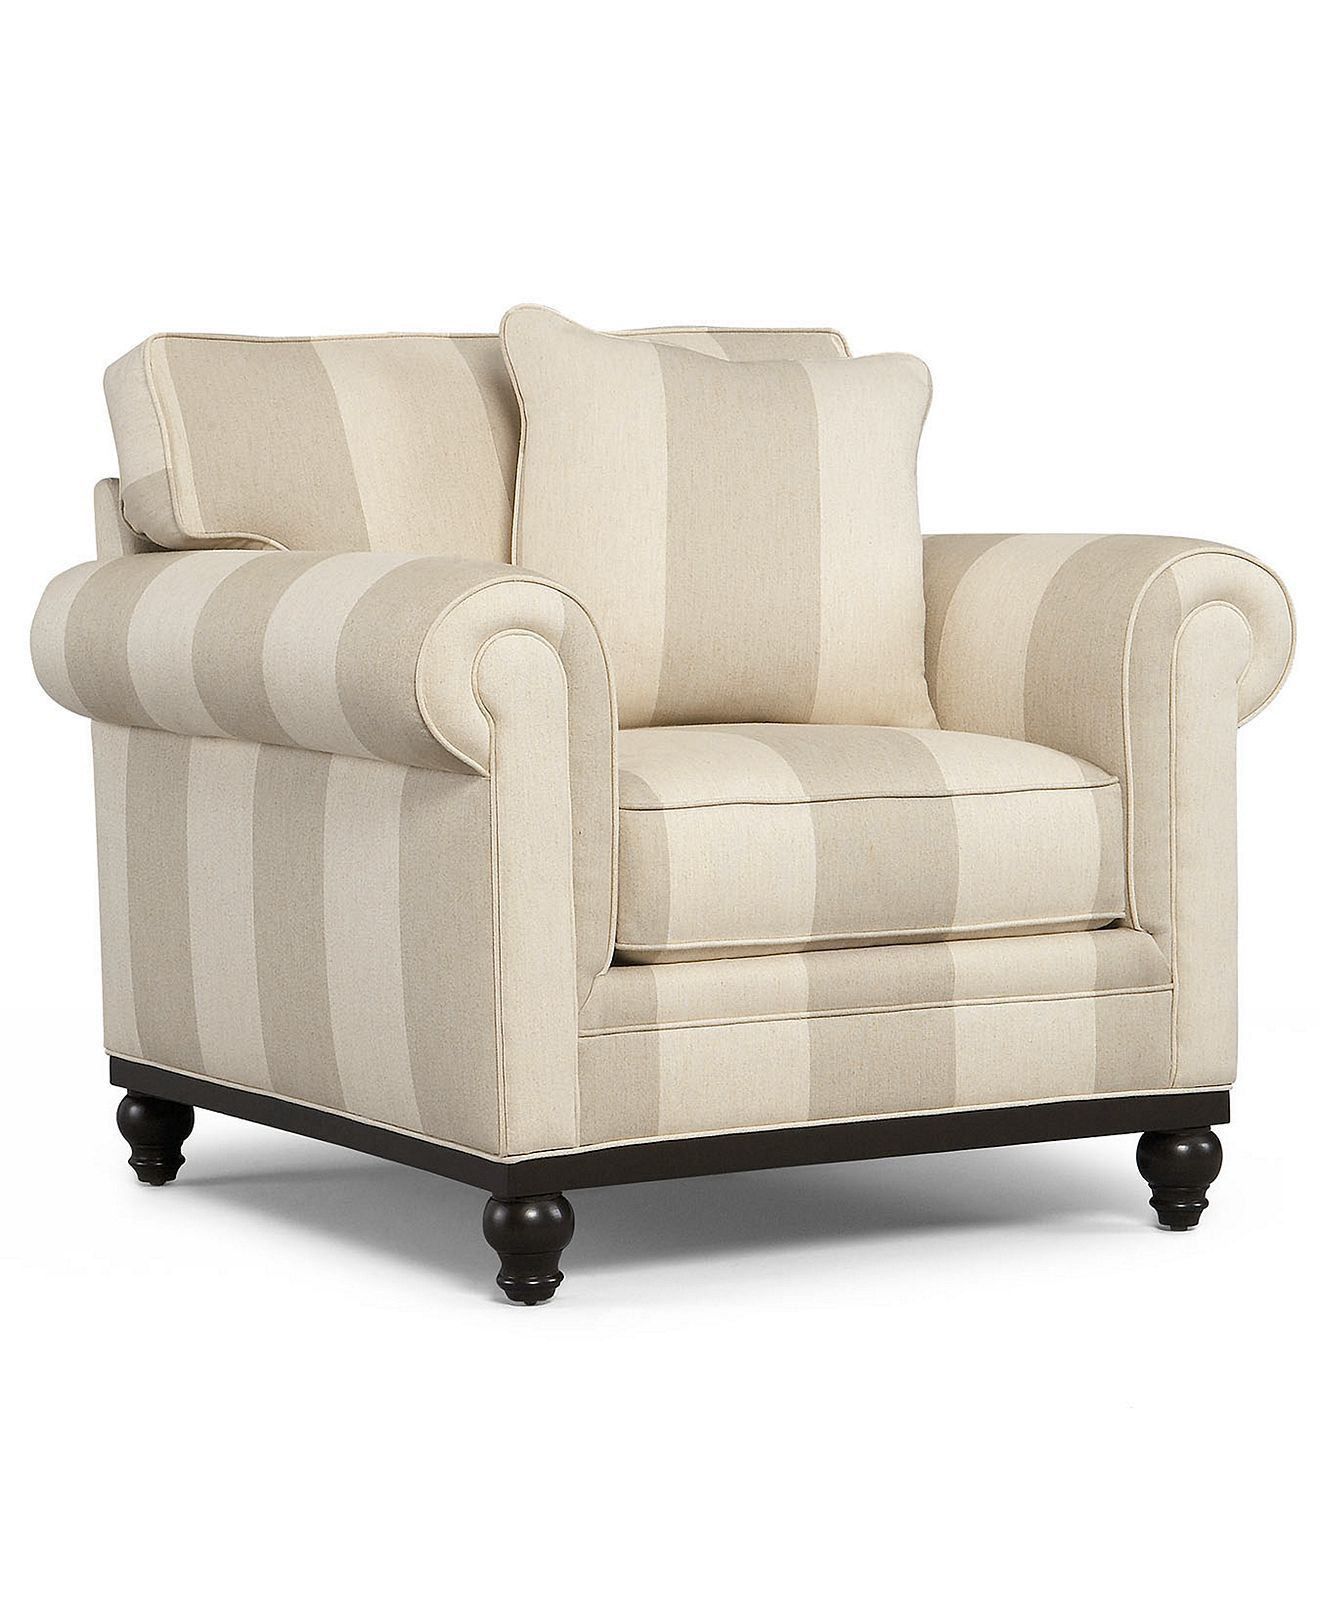 Martha stewart collection fabric arm chair club custom for Martha stewart furniture